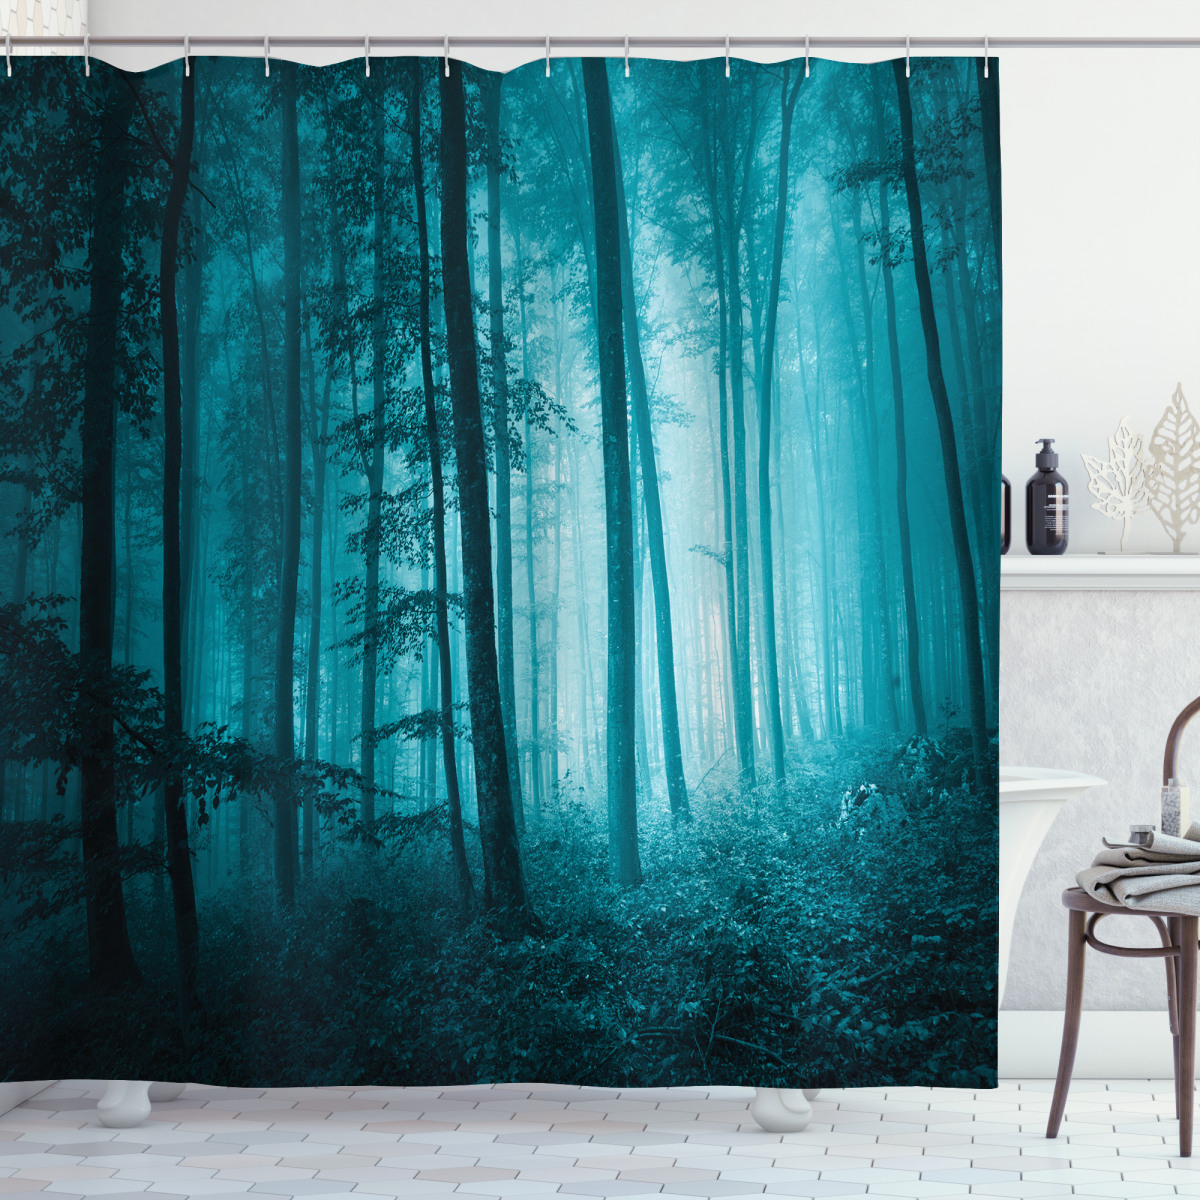 Foggy Dark Country Forest Shower Curtain